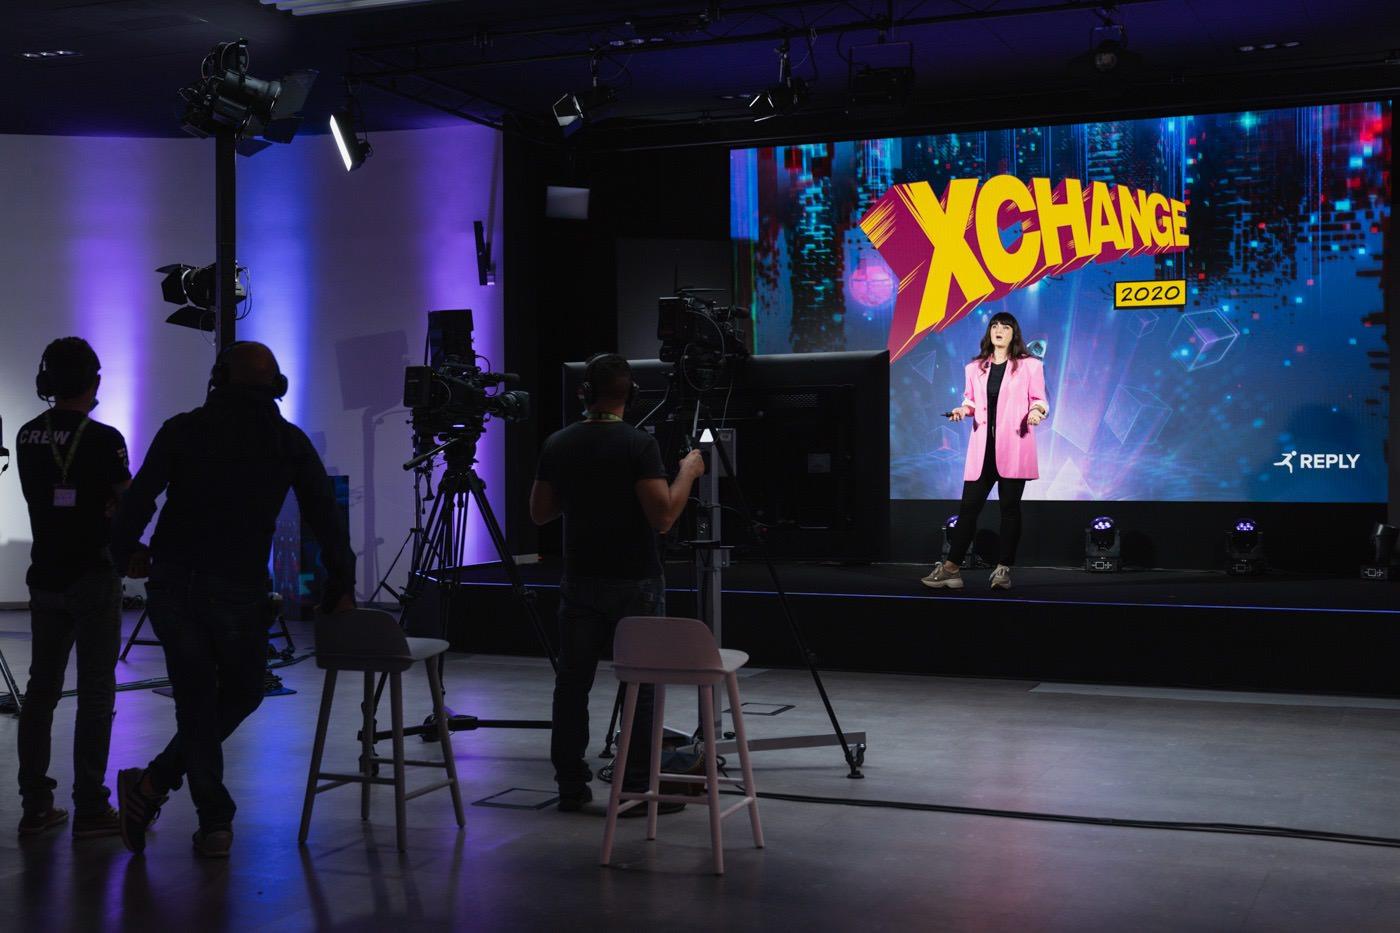 reply-xchange-2020-gruppo-peroni-eventi-03